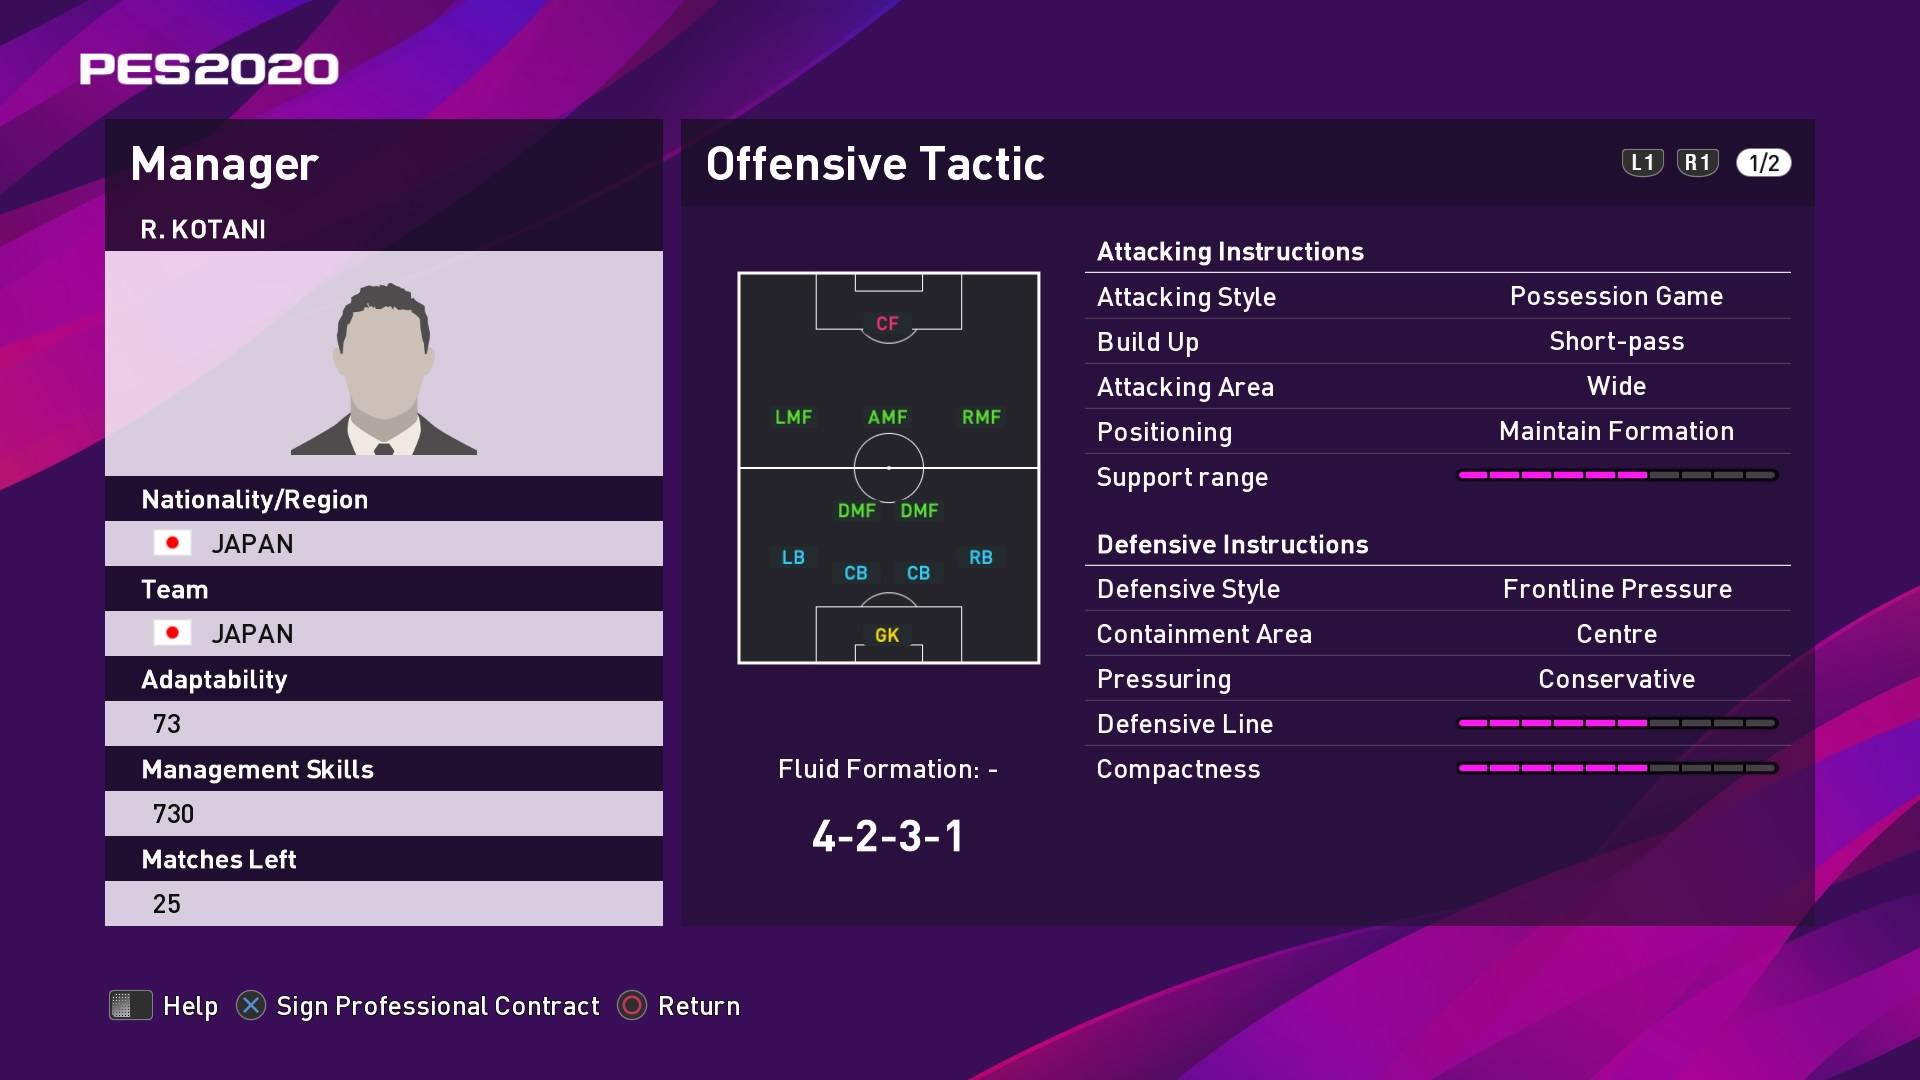 R. Kotani (Hajime Moriyasu) Offensive Tactic in PES 2020 myClub